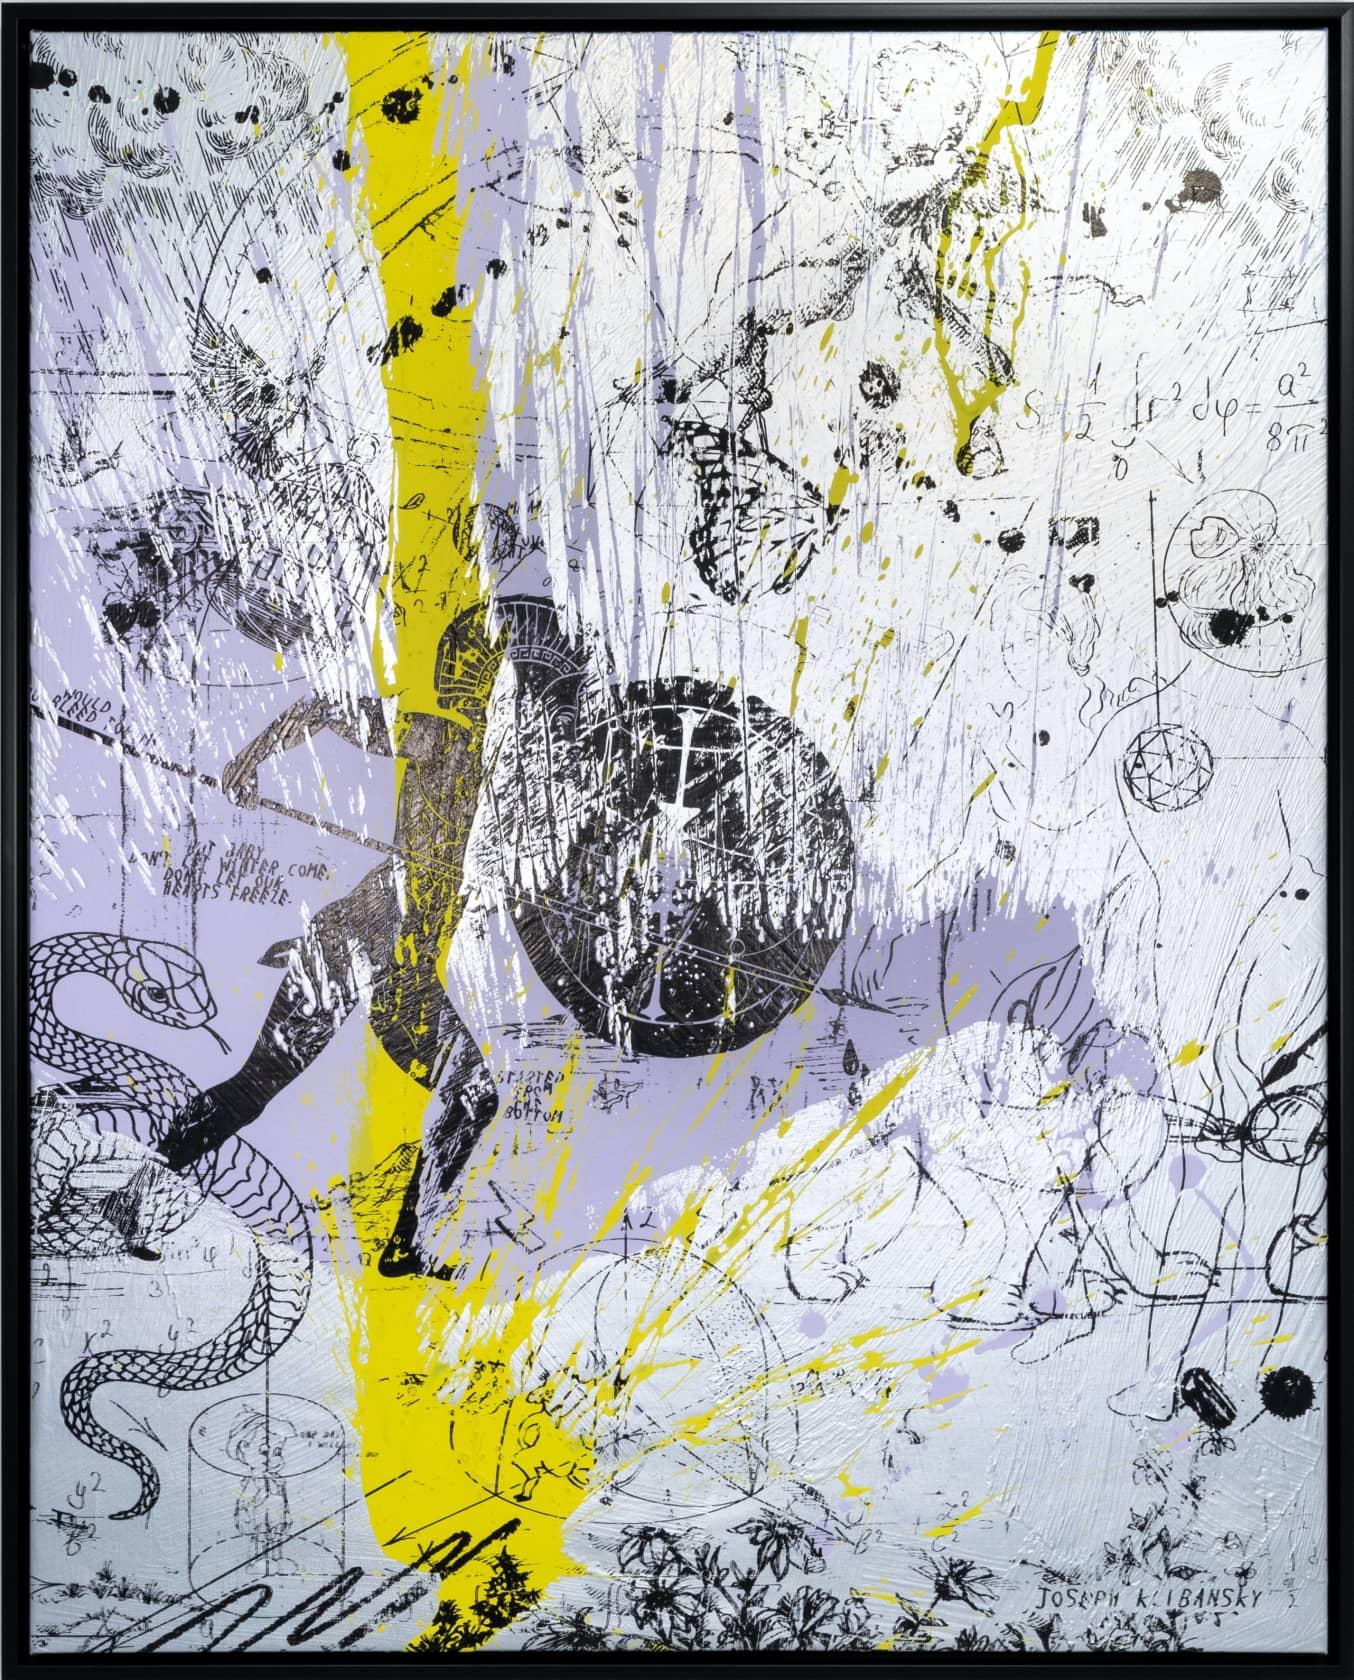 Joseph Klibansky, Forever Mine (Silver/Black, Lilac and Yellow Splash), 2020, 2021